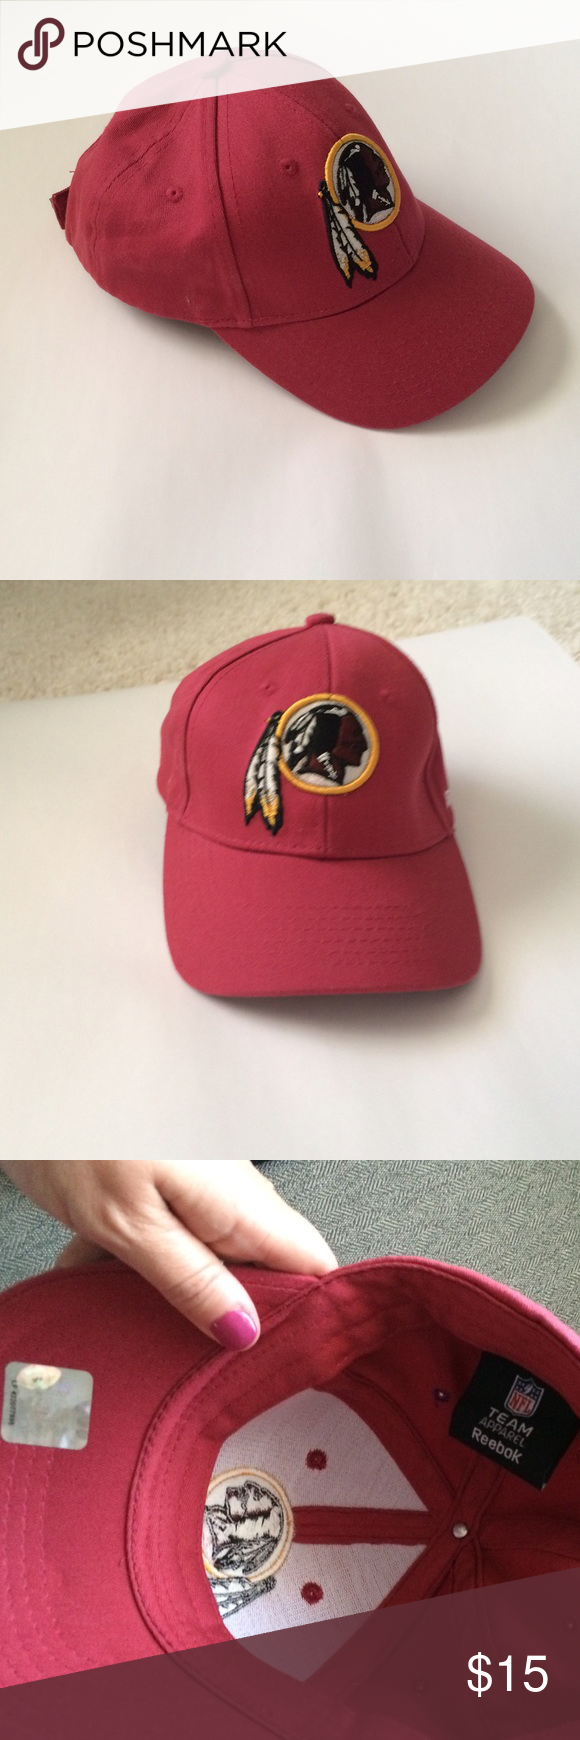 64ed60c03 NFL Redskins  boys  Hat Reebok Maroon Redskins hat